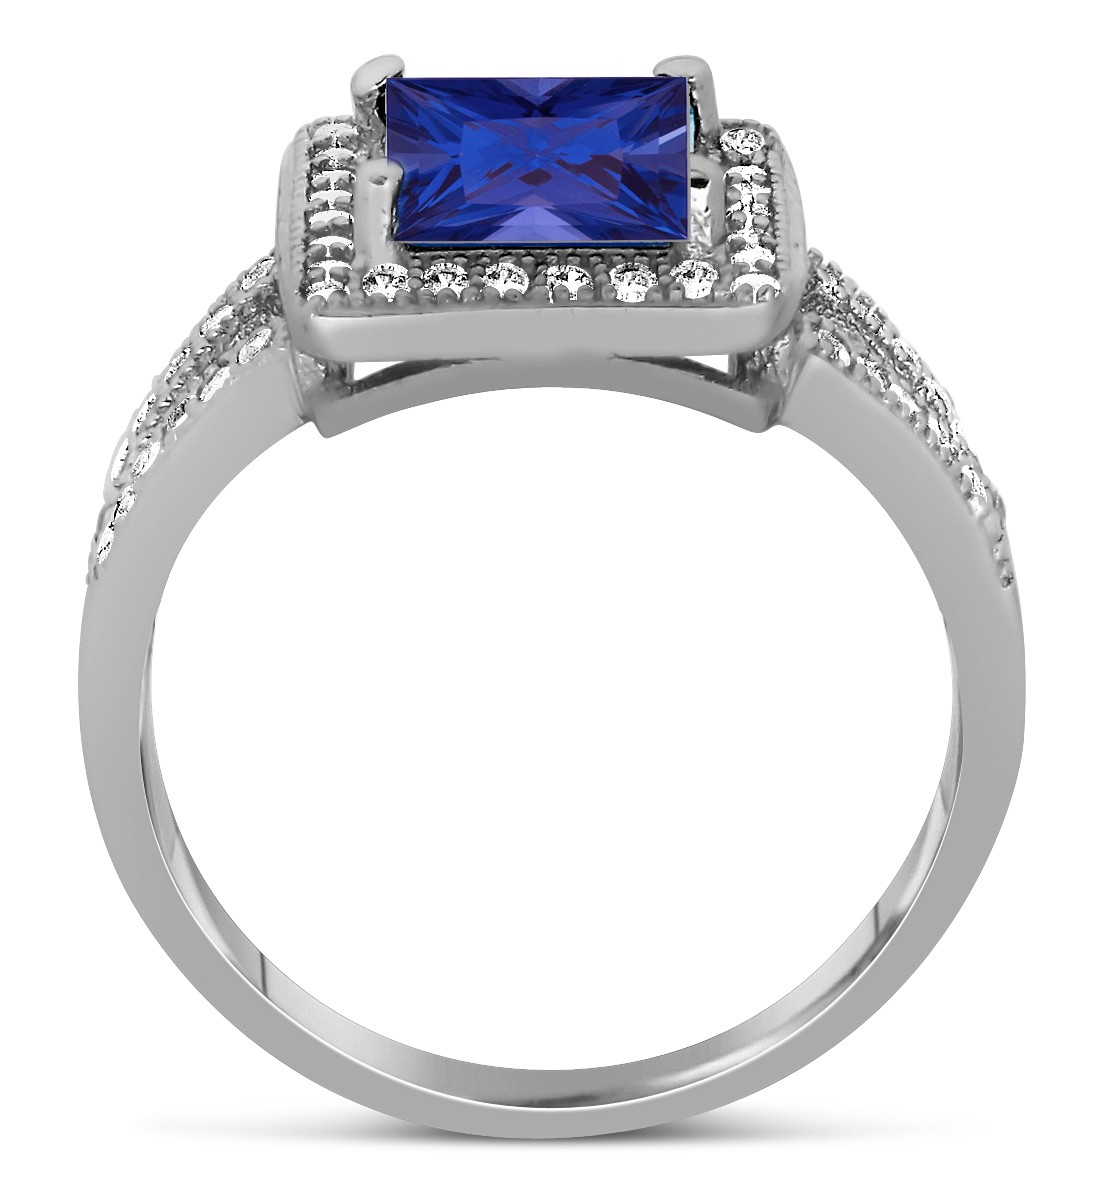 designer 2 carat princess cut blue sapphire and